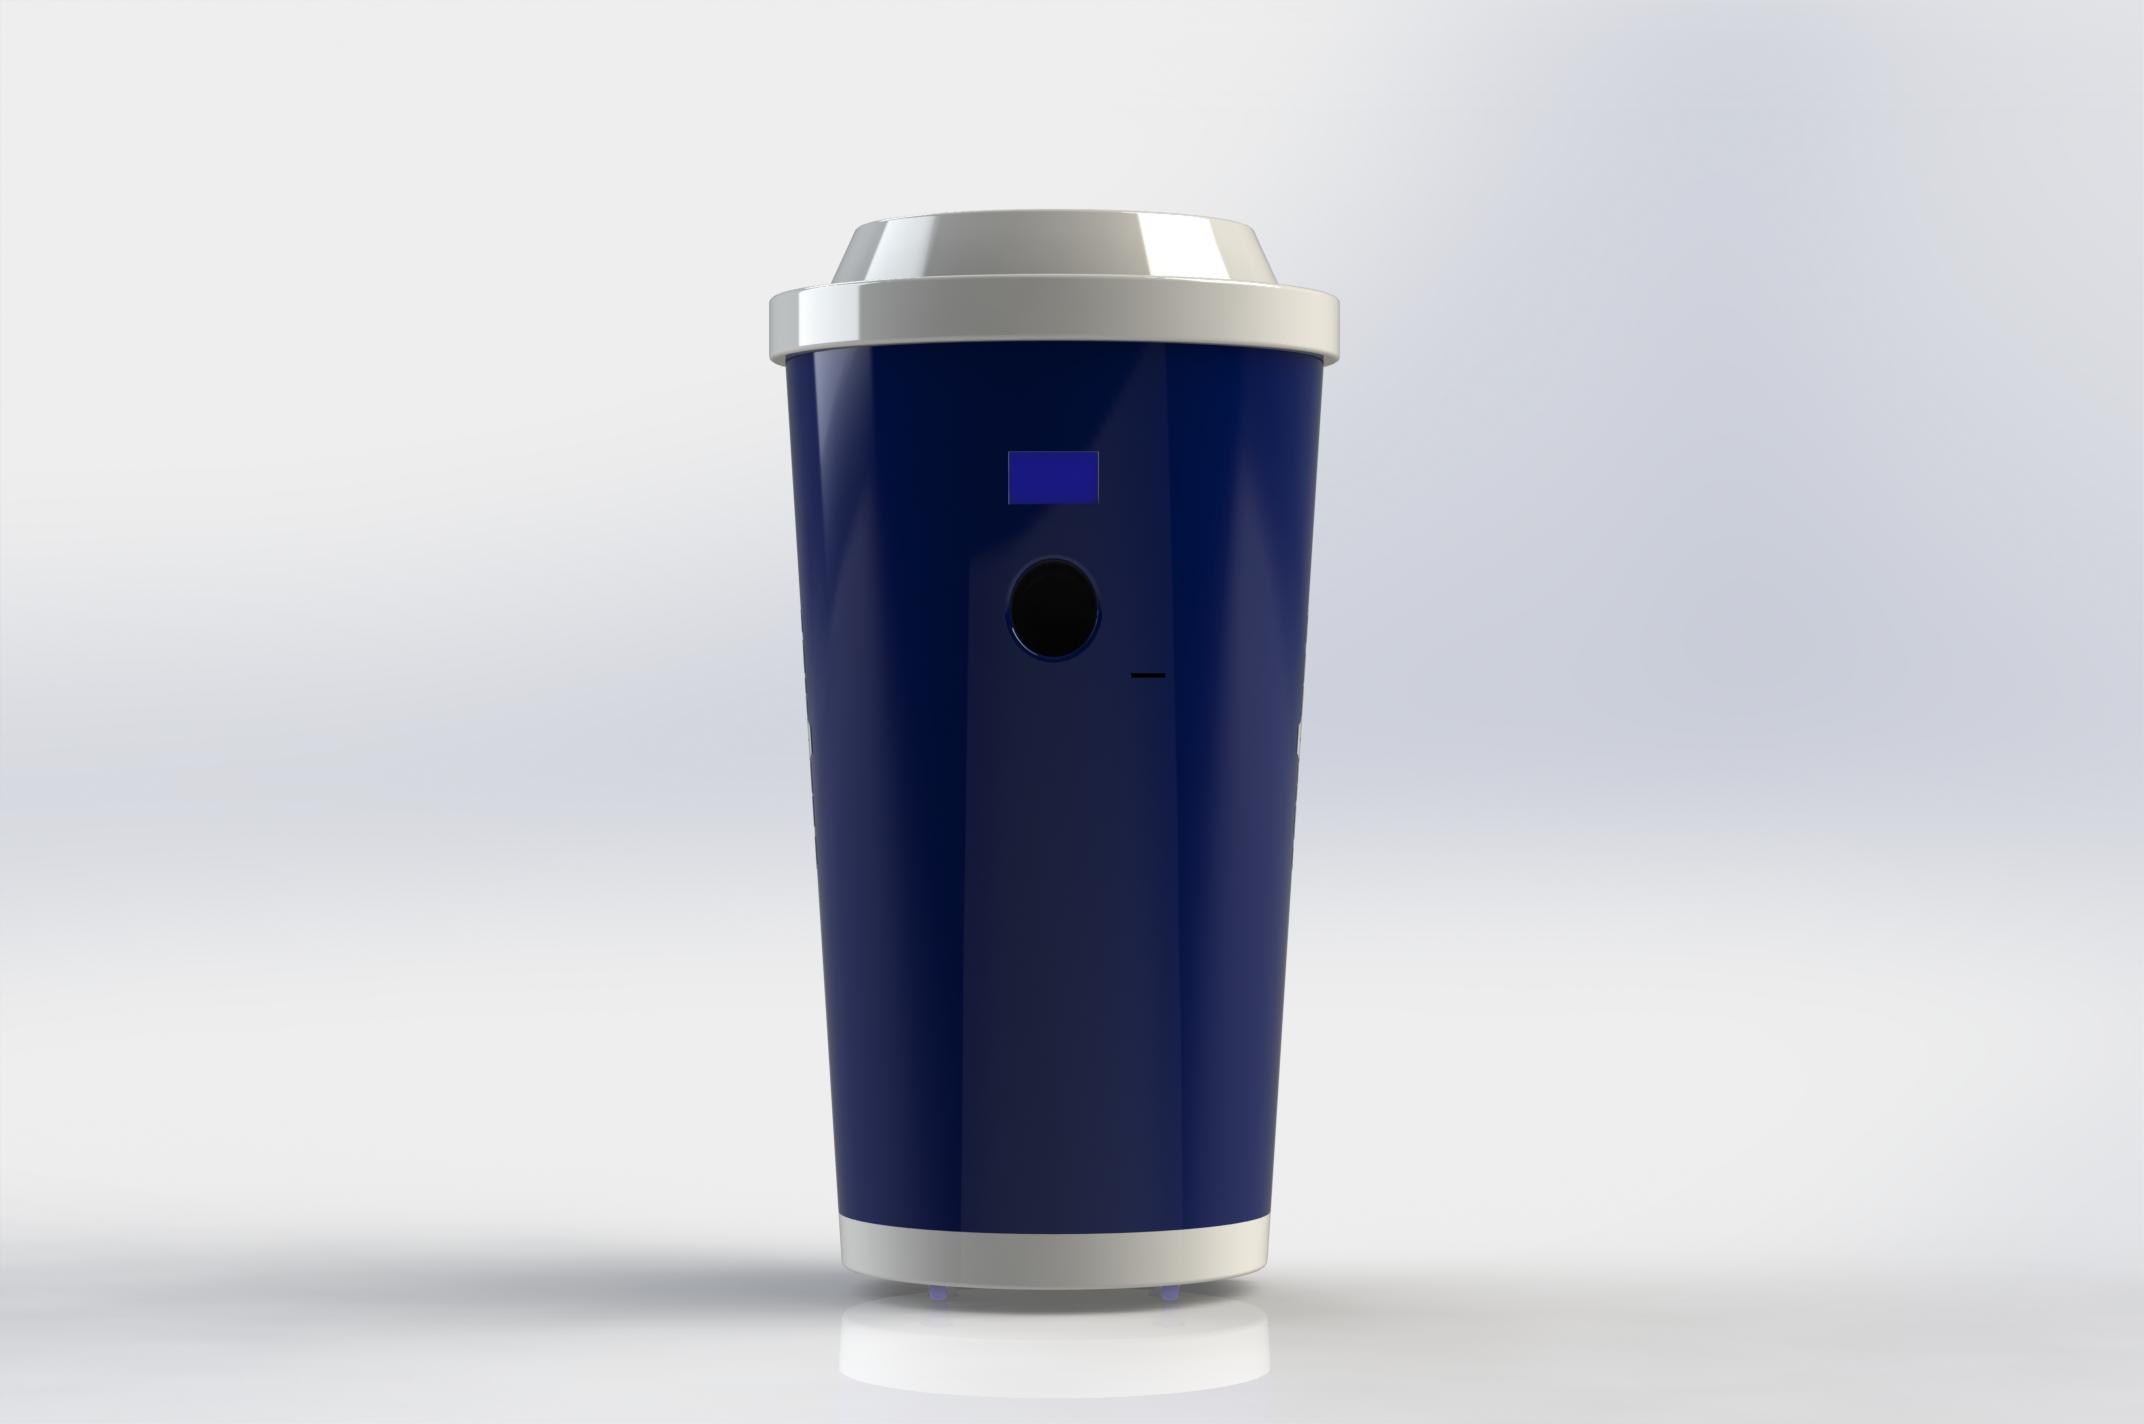 RÜcknahmeautomat Kaffee to go; Automat Mehrwegbecher; Spendeautomat Kaffee to go